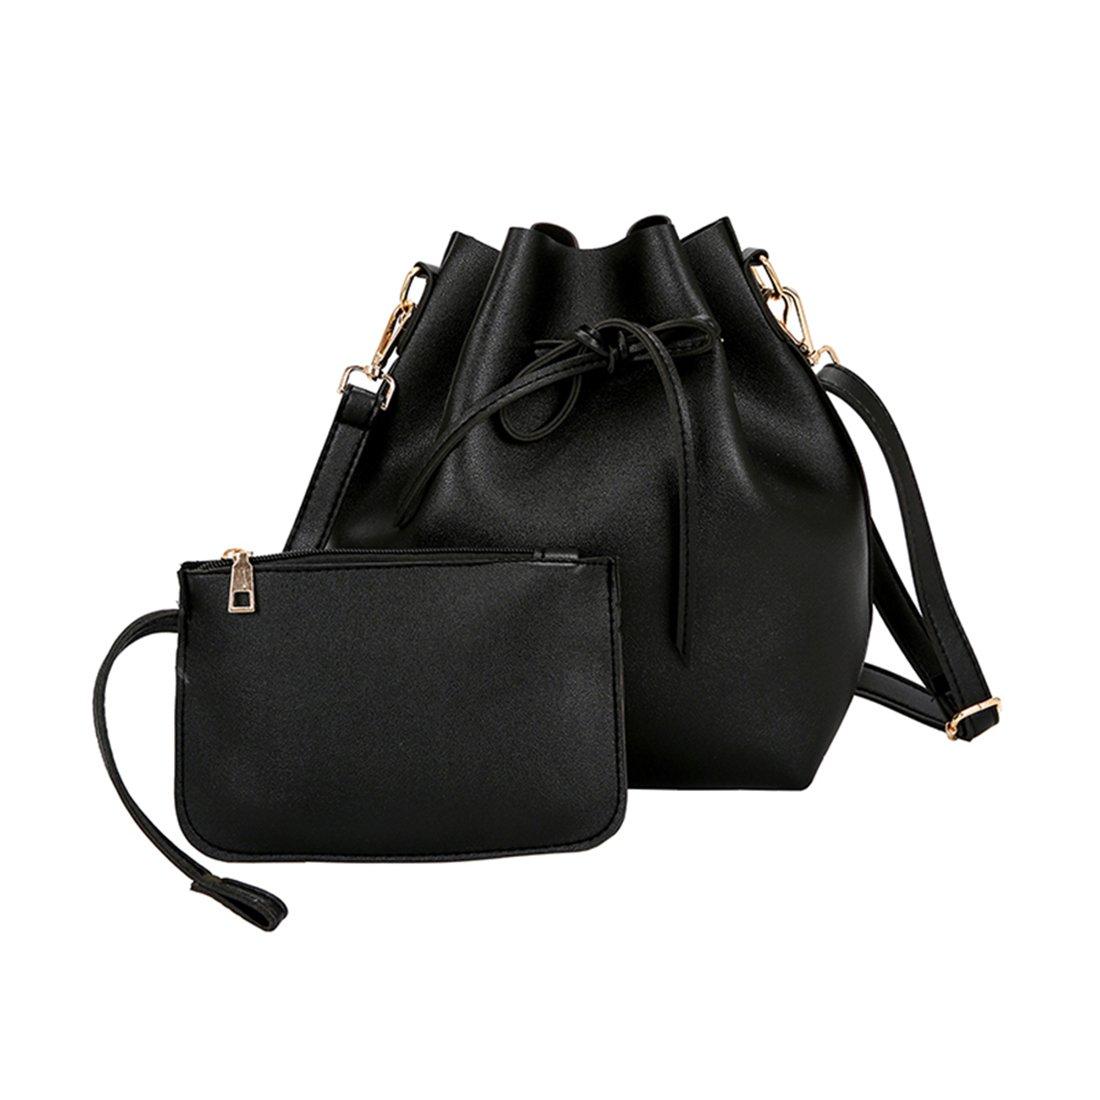 Women Textured Faux Leather Drawstring Style Mini Handbag Bucket Shoulder Bag (Black2)